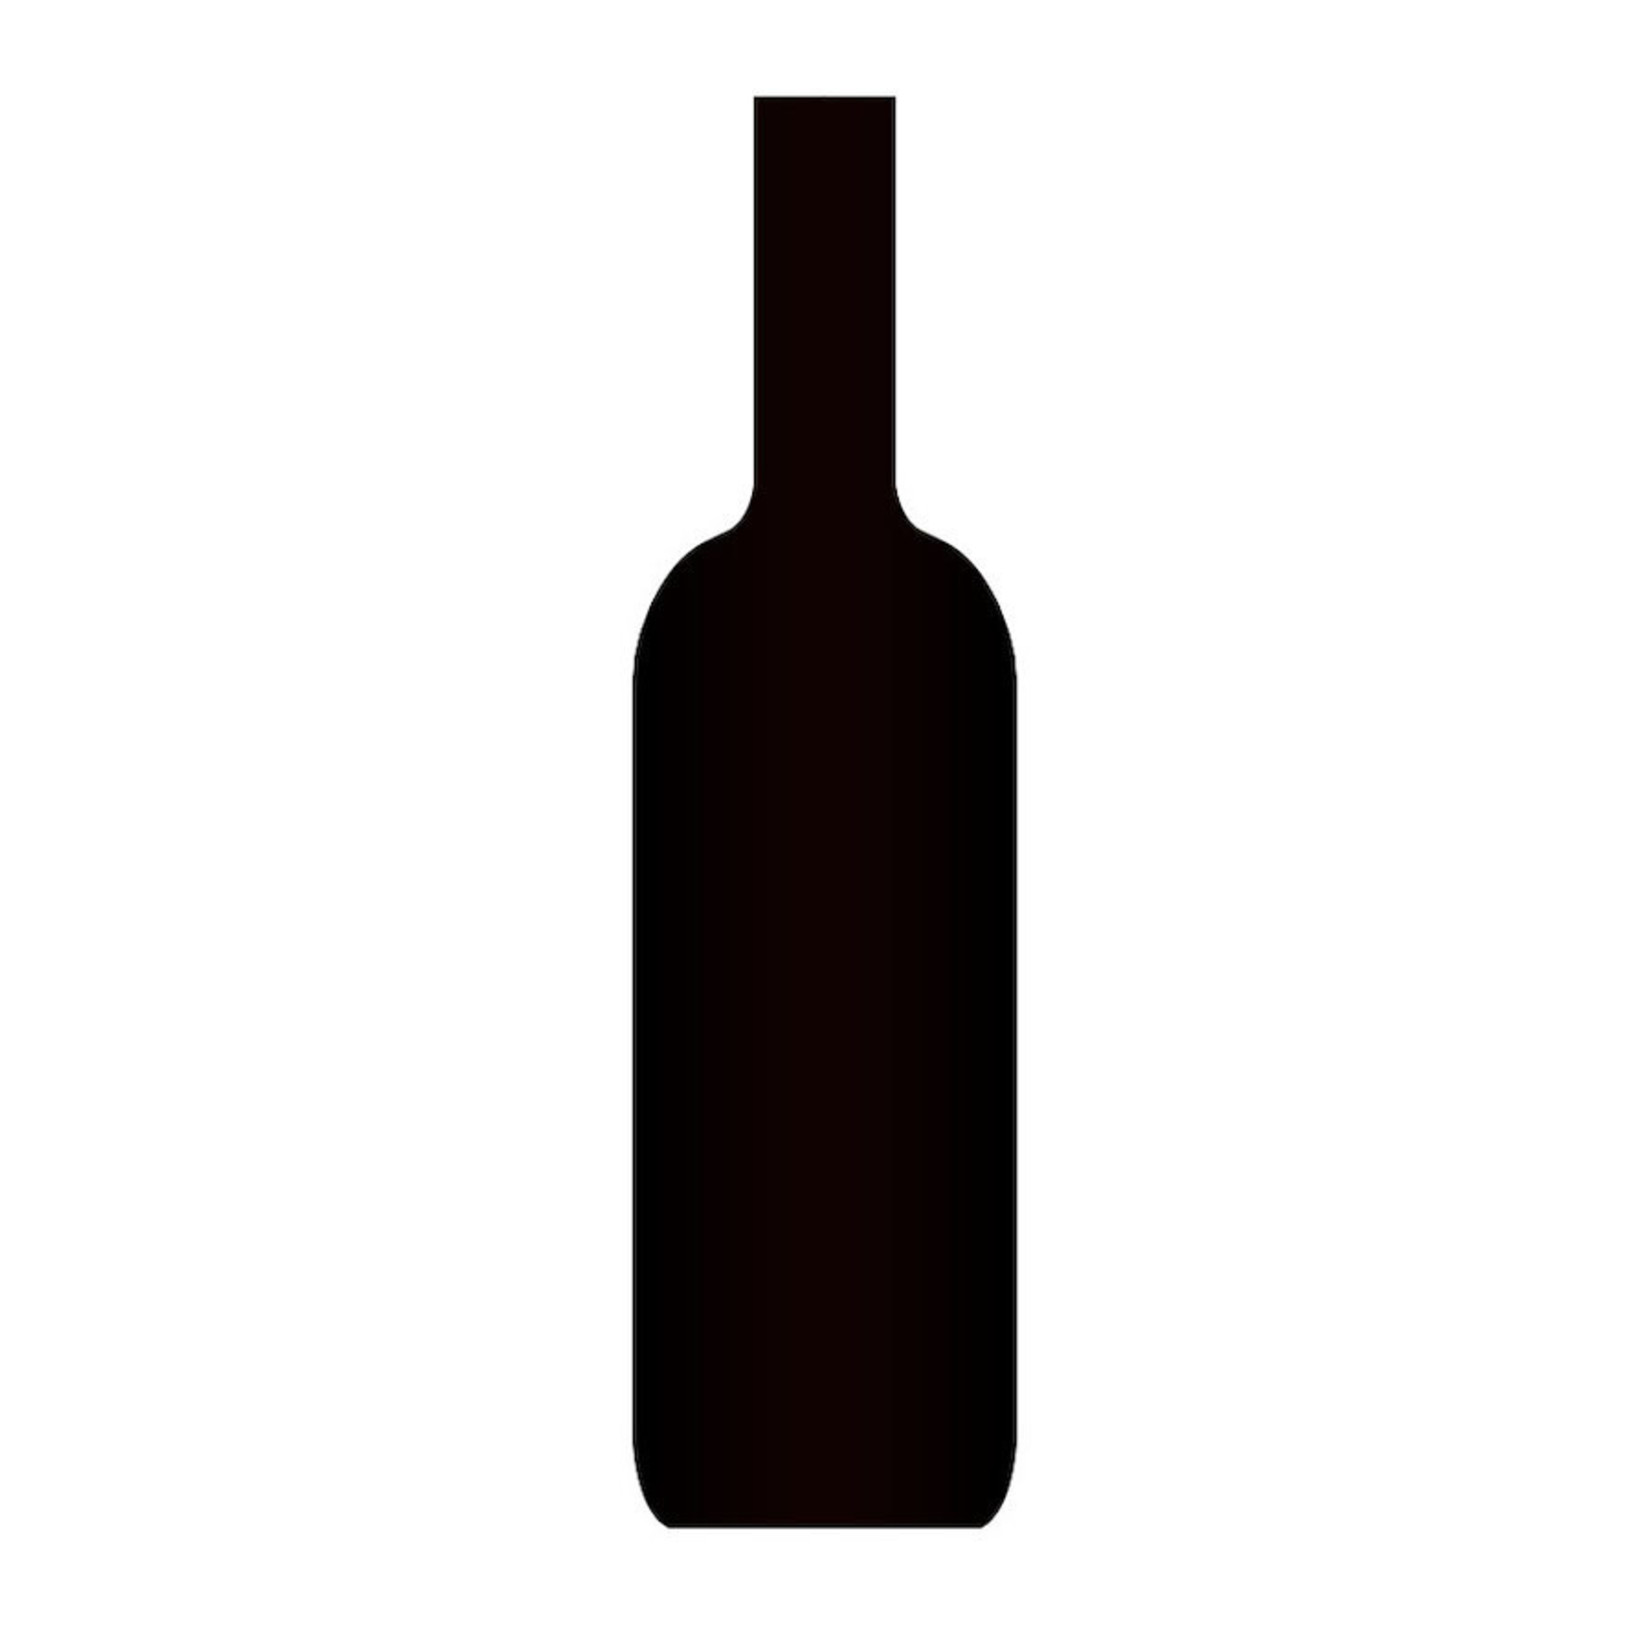 2018 Avignonesi Rosso di Montepulciano